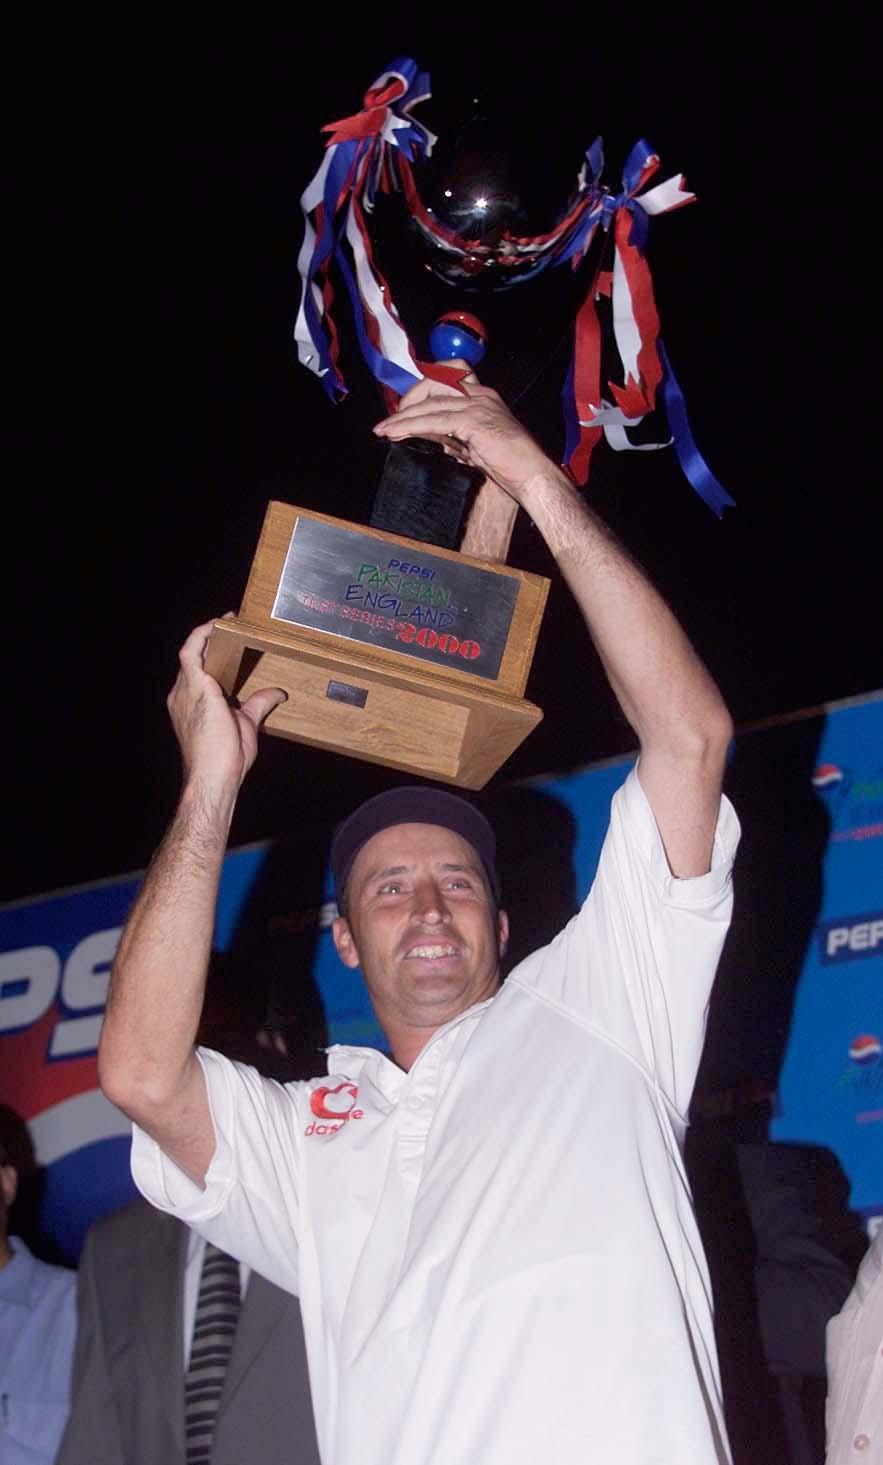 Nasser Hussain lifts the trophy in the dark after a impressive win in Karachi